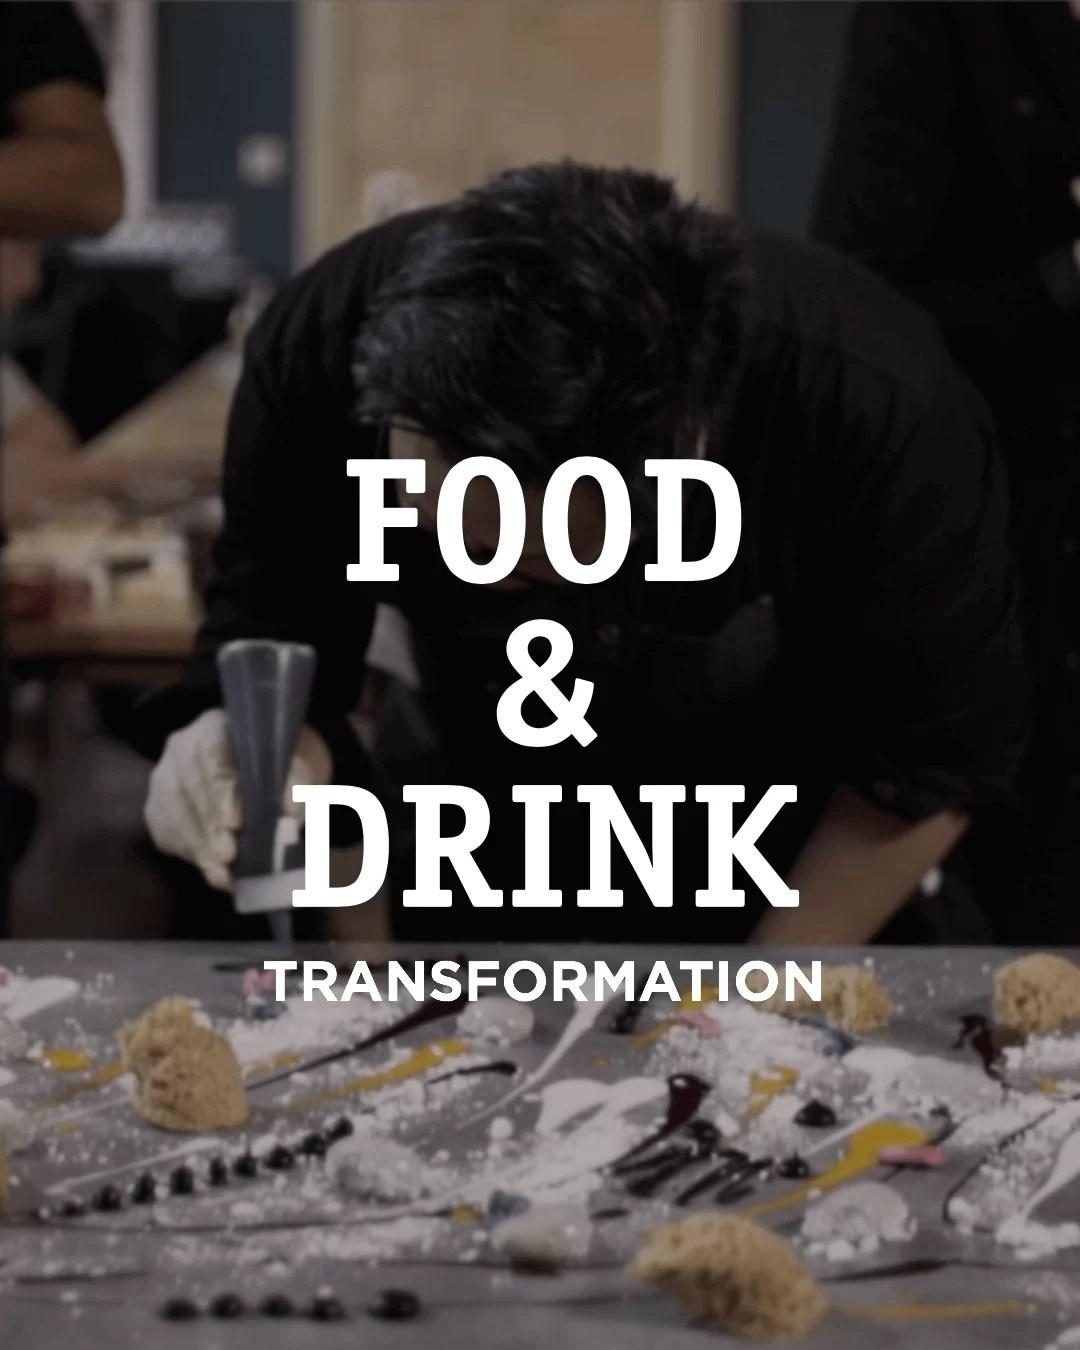 Food & Drink Transformation